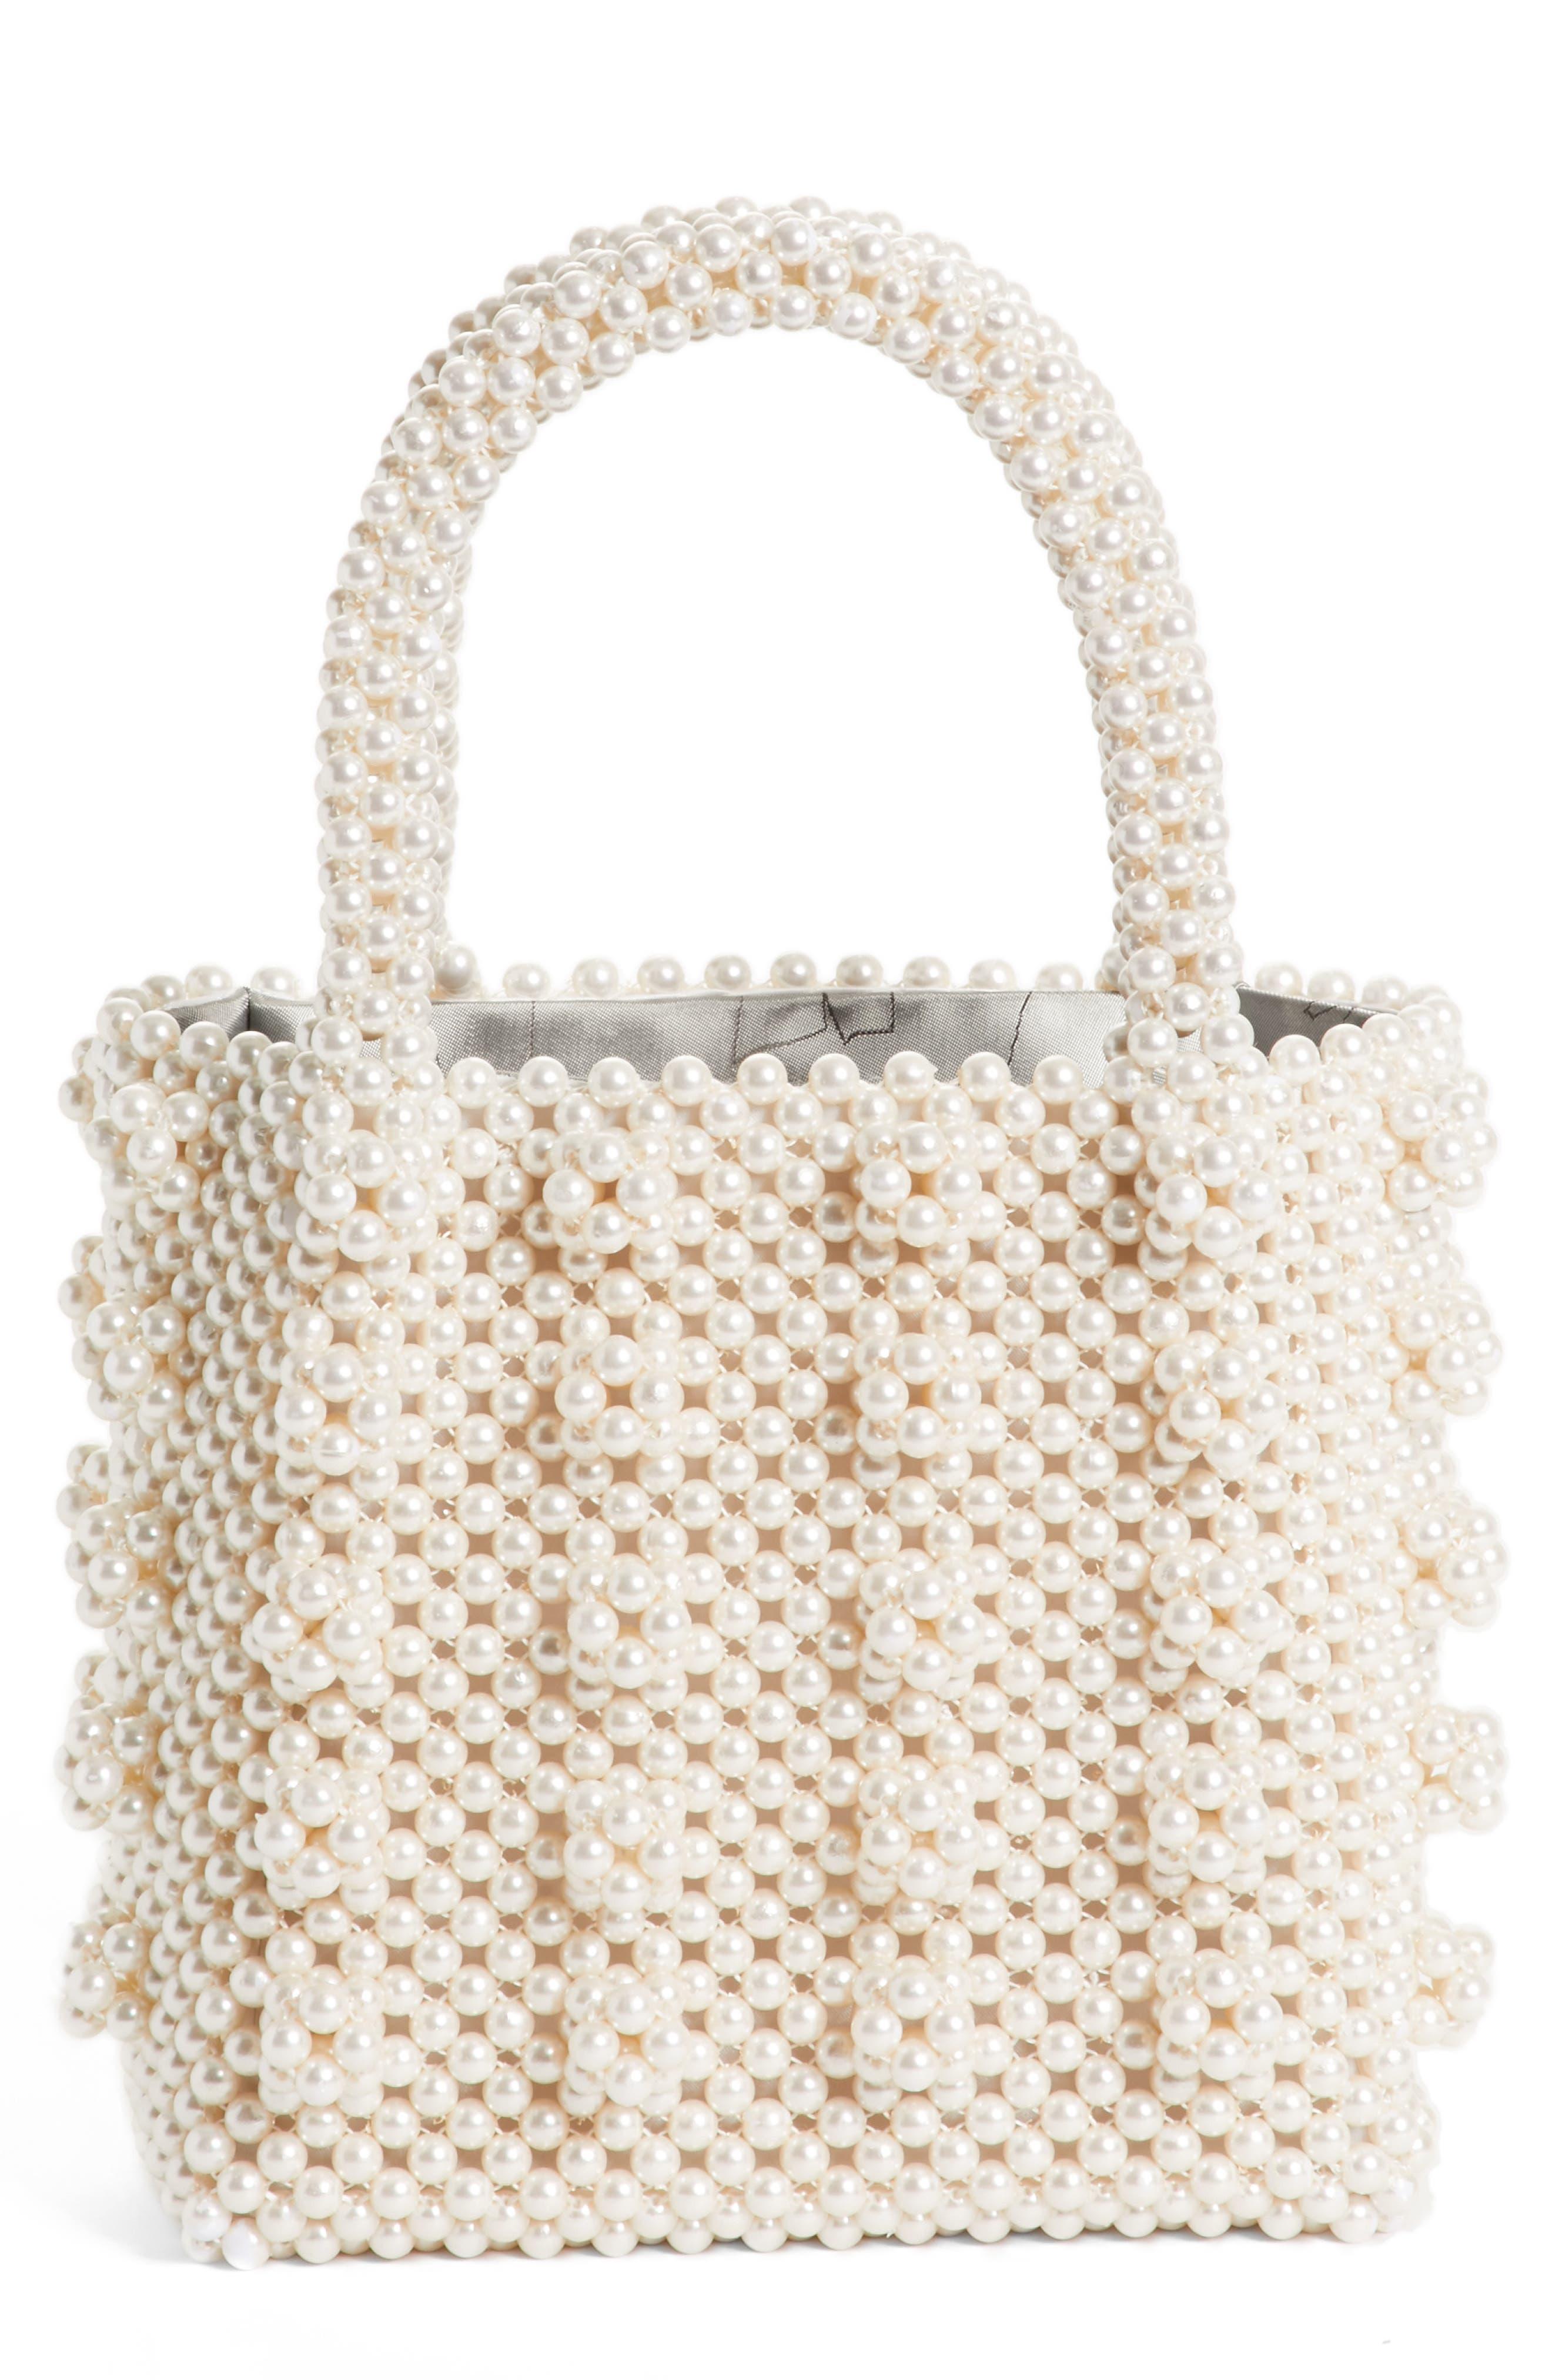 Antonia Small Imitation Pearl Beaded Handbag,                         Main,                         color, 900